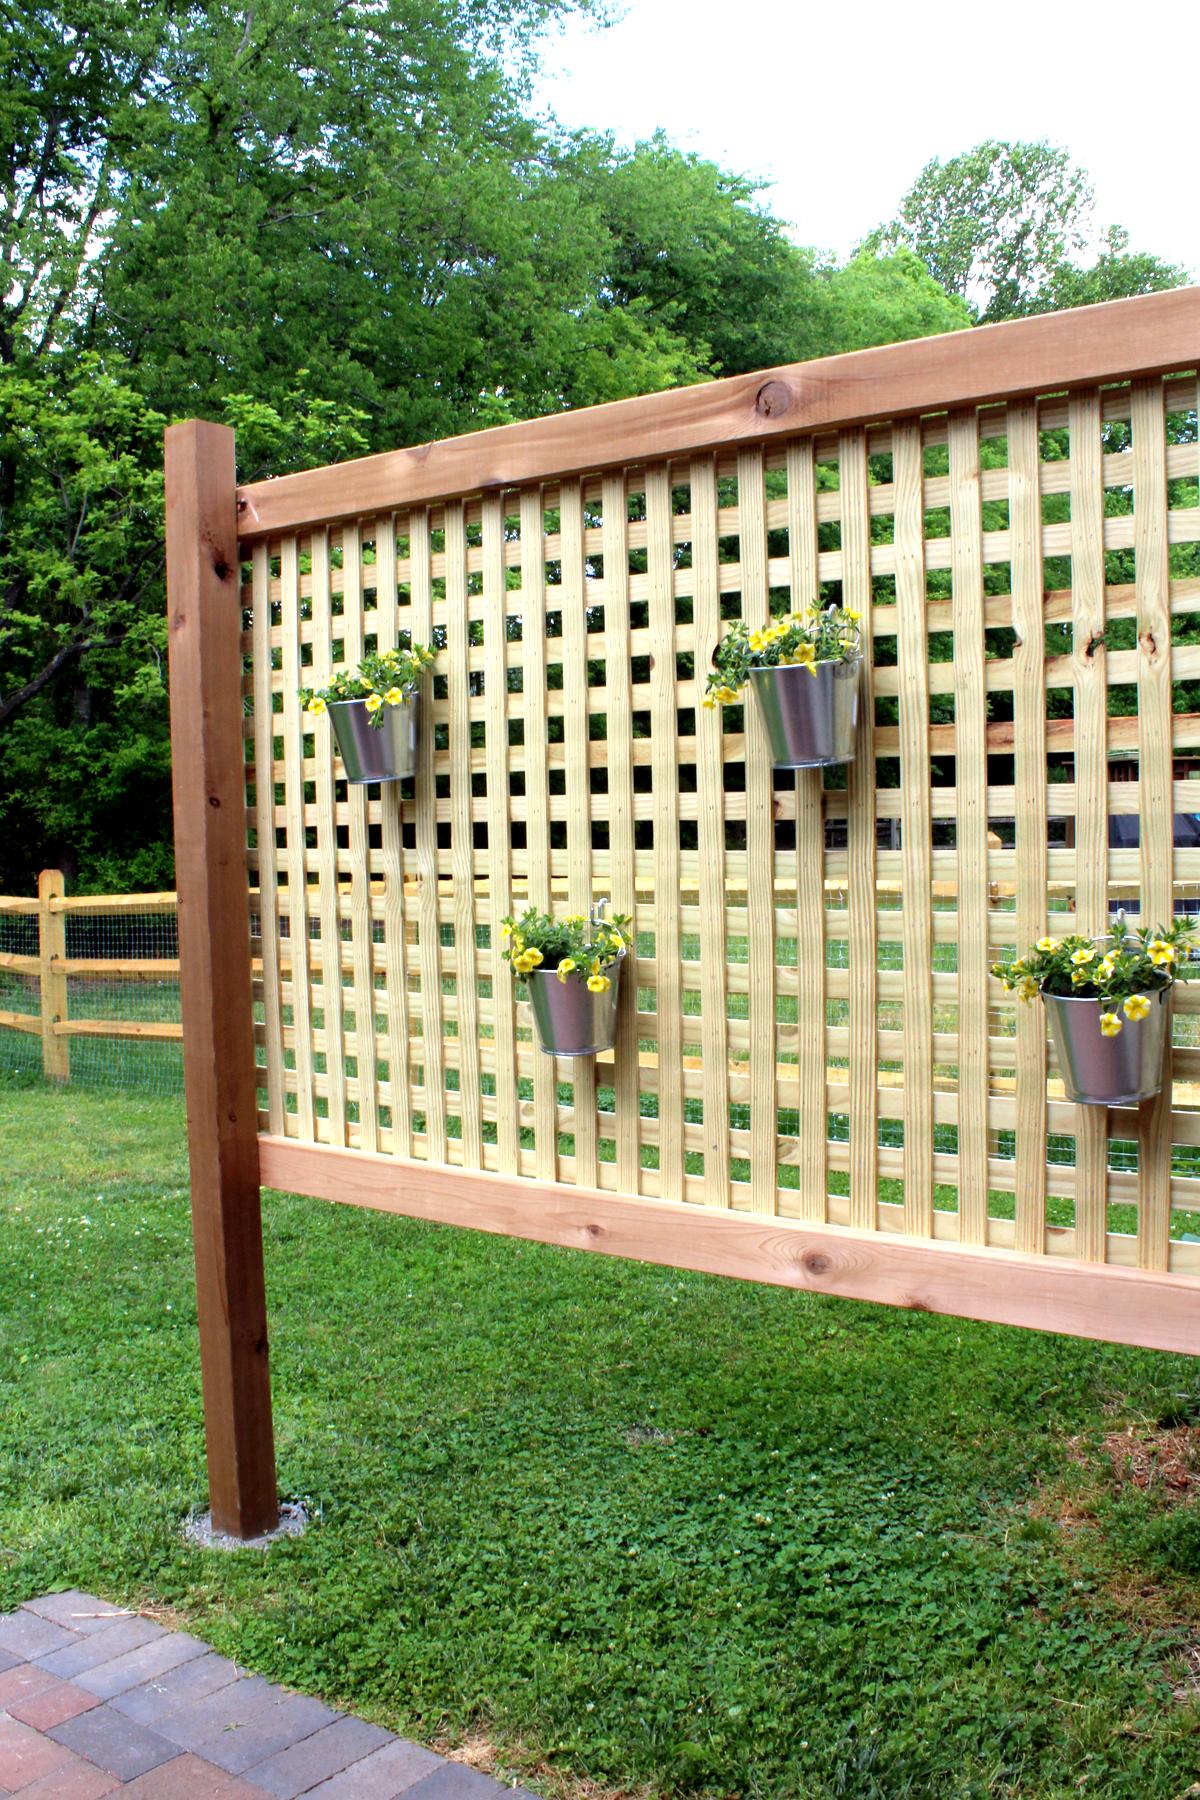 wood privacy screen DIY, weekend project idea!